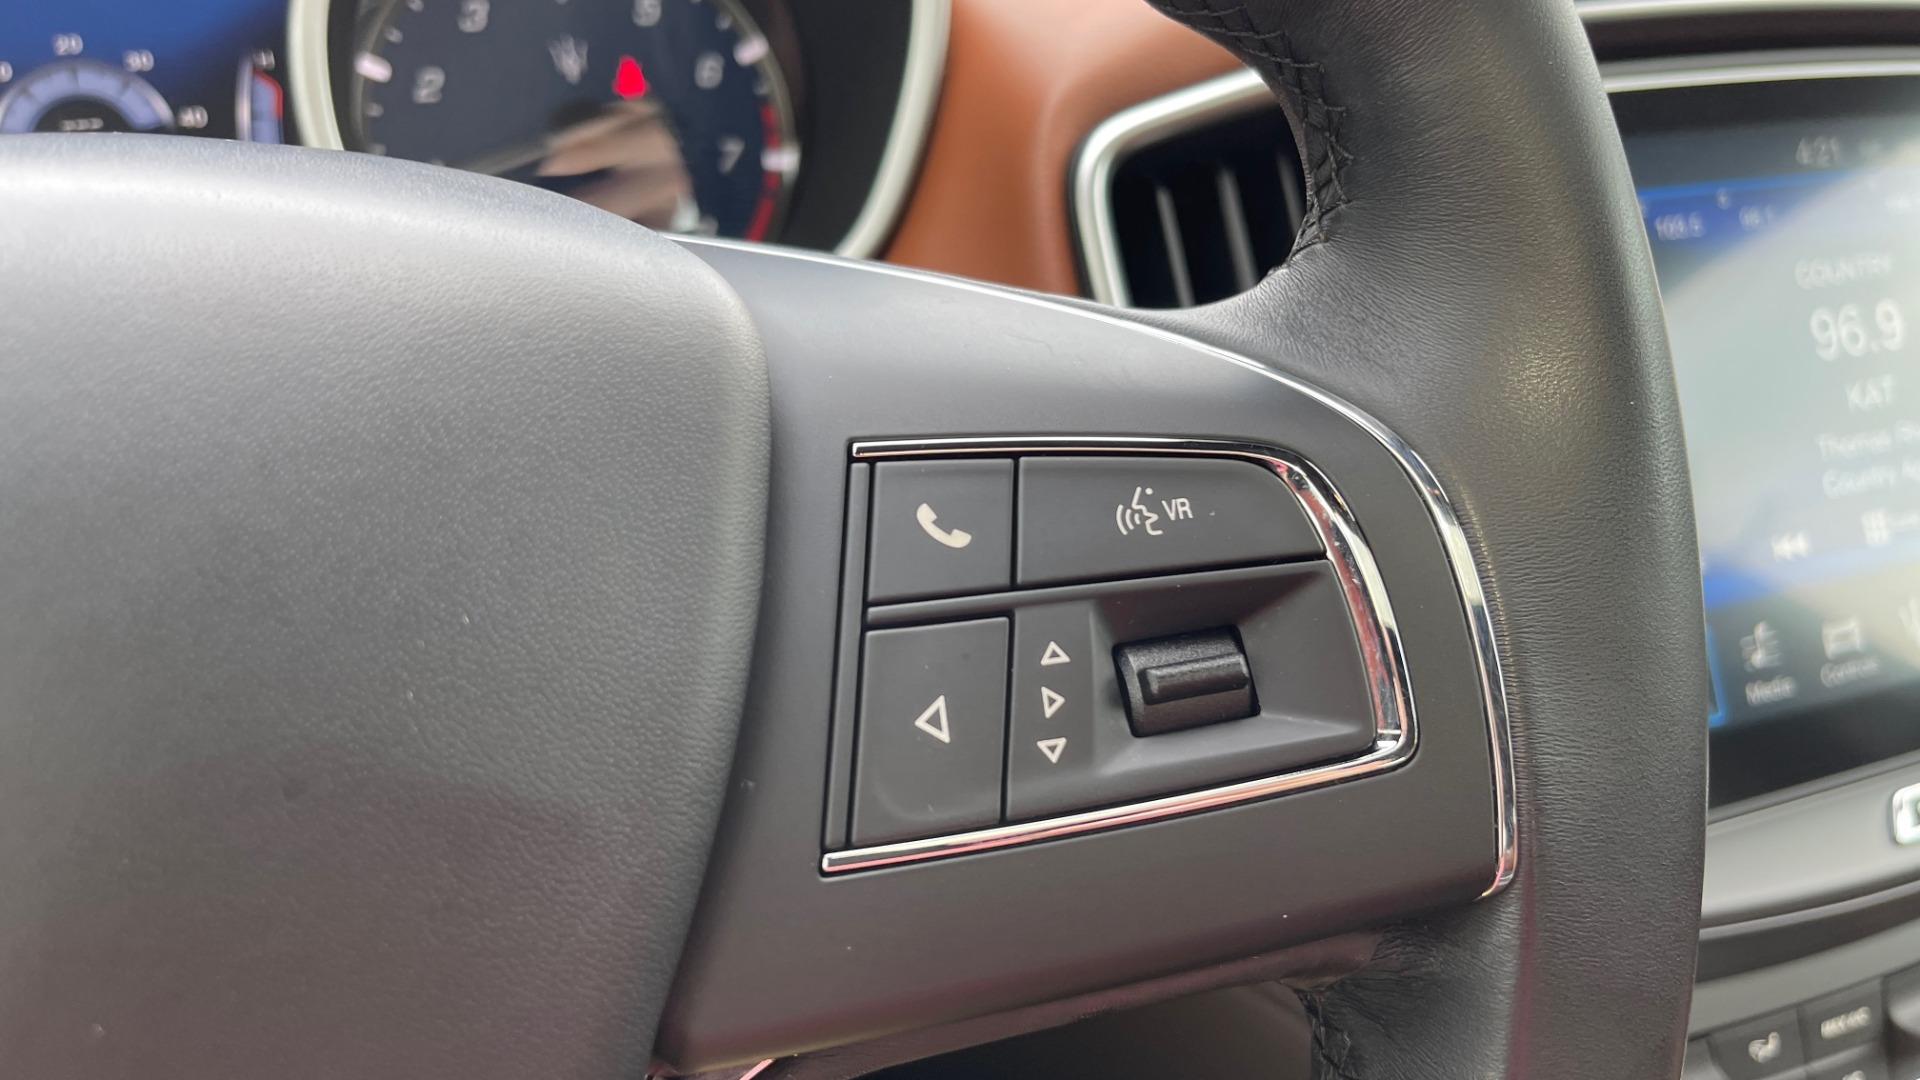 Used 2018 Maserati GHIBLI 3.0L SEDAN / 8-SPD AUTO / NAV / SUNROOF / REARVIEW for sale $42,995 at Formula Imports in Charlotte NC 28227 34